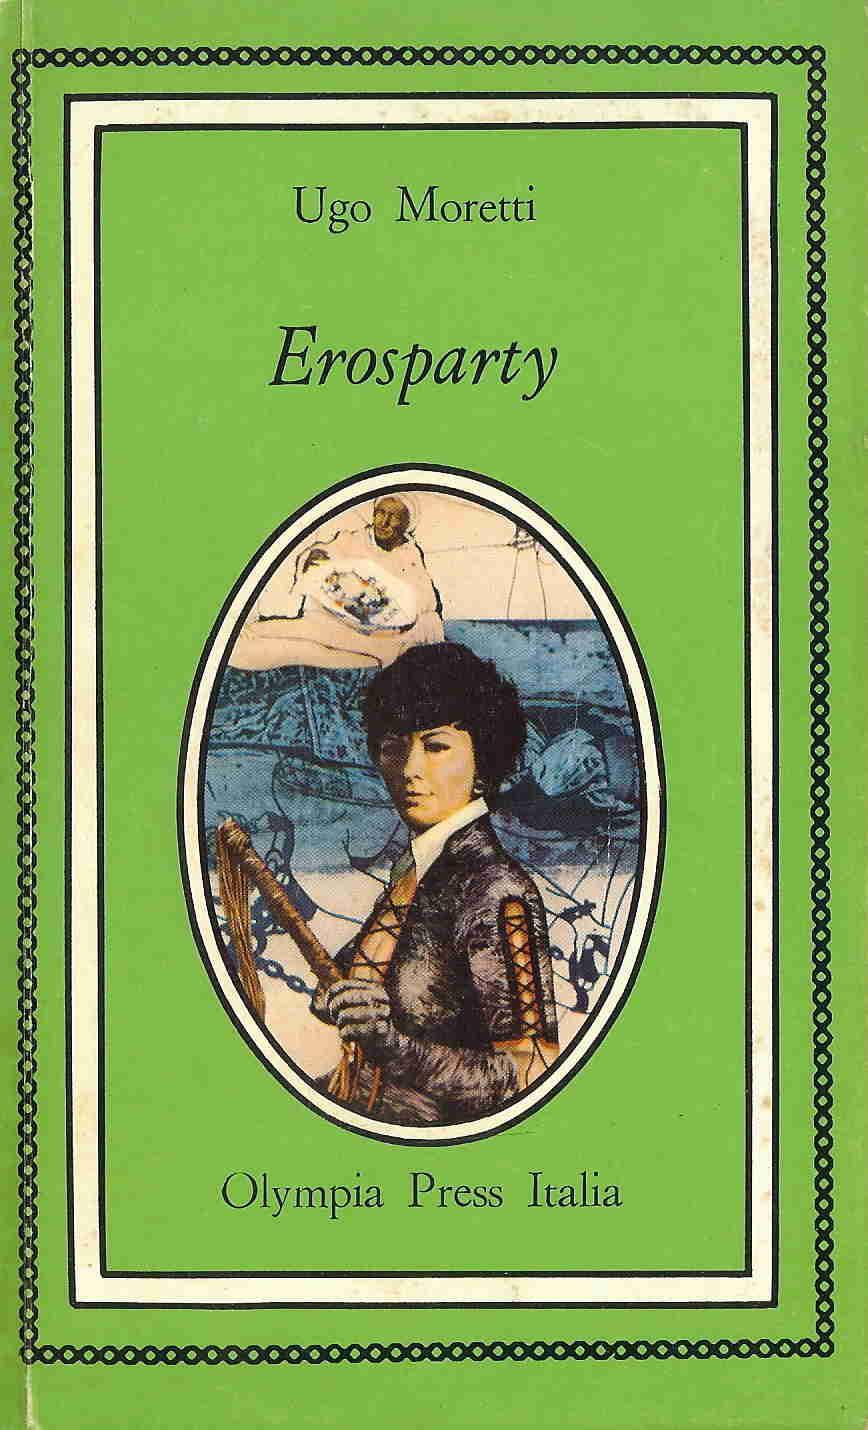 Erosparty